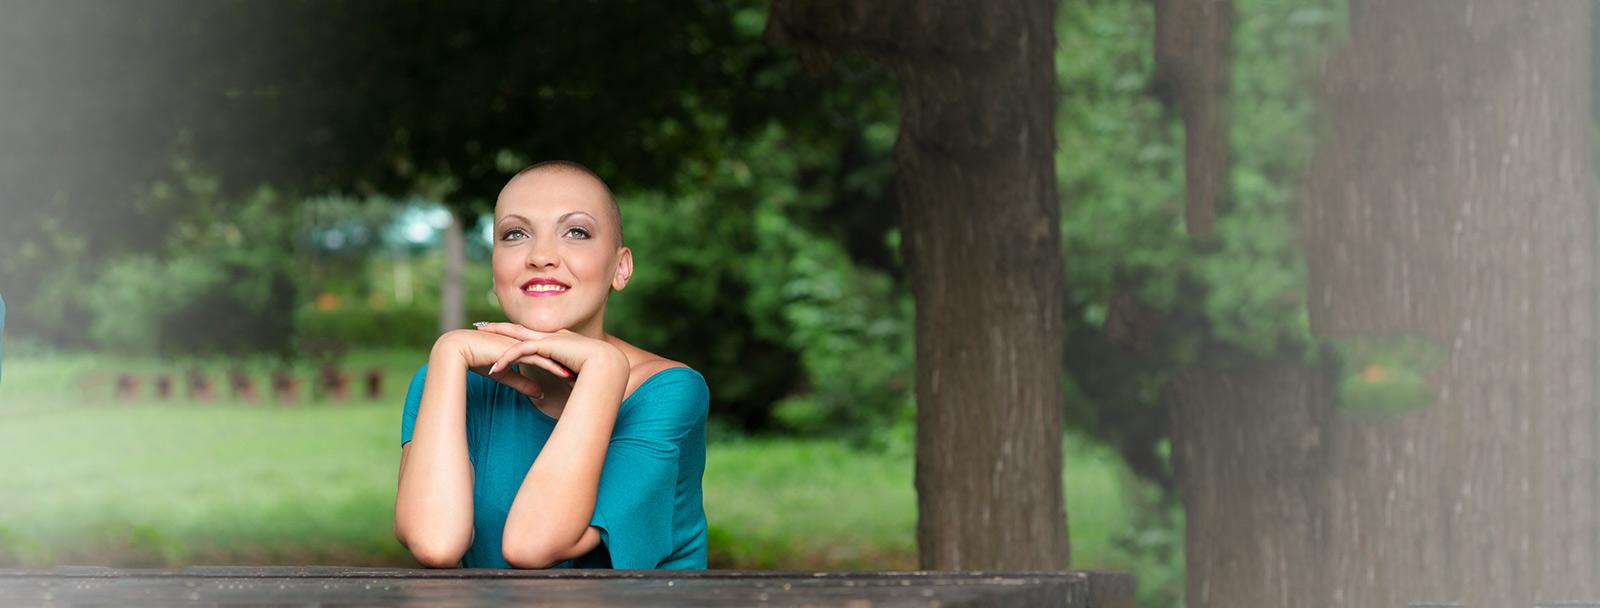 Cancer-Treatment-Otolaryngology-Associates-of-Tennessee_wide.jpg